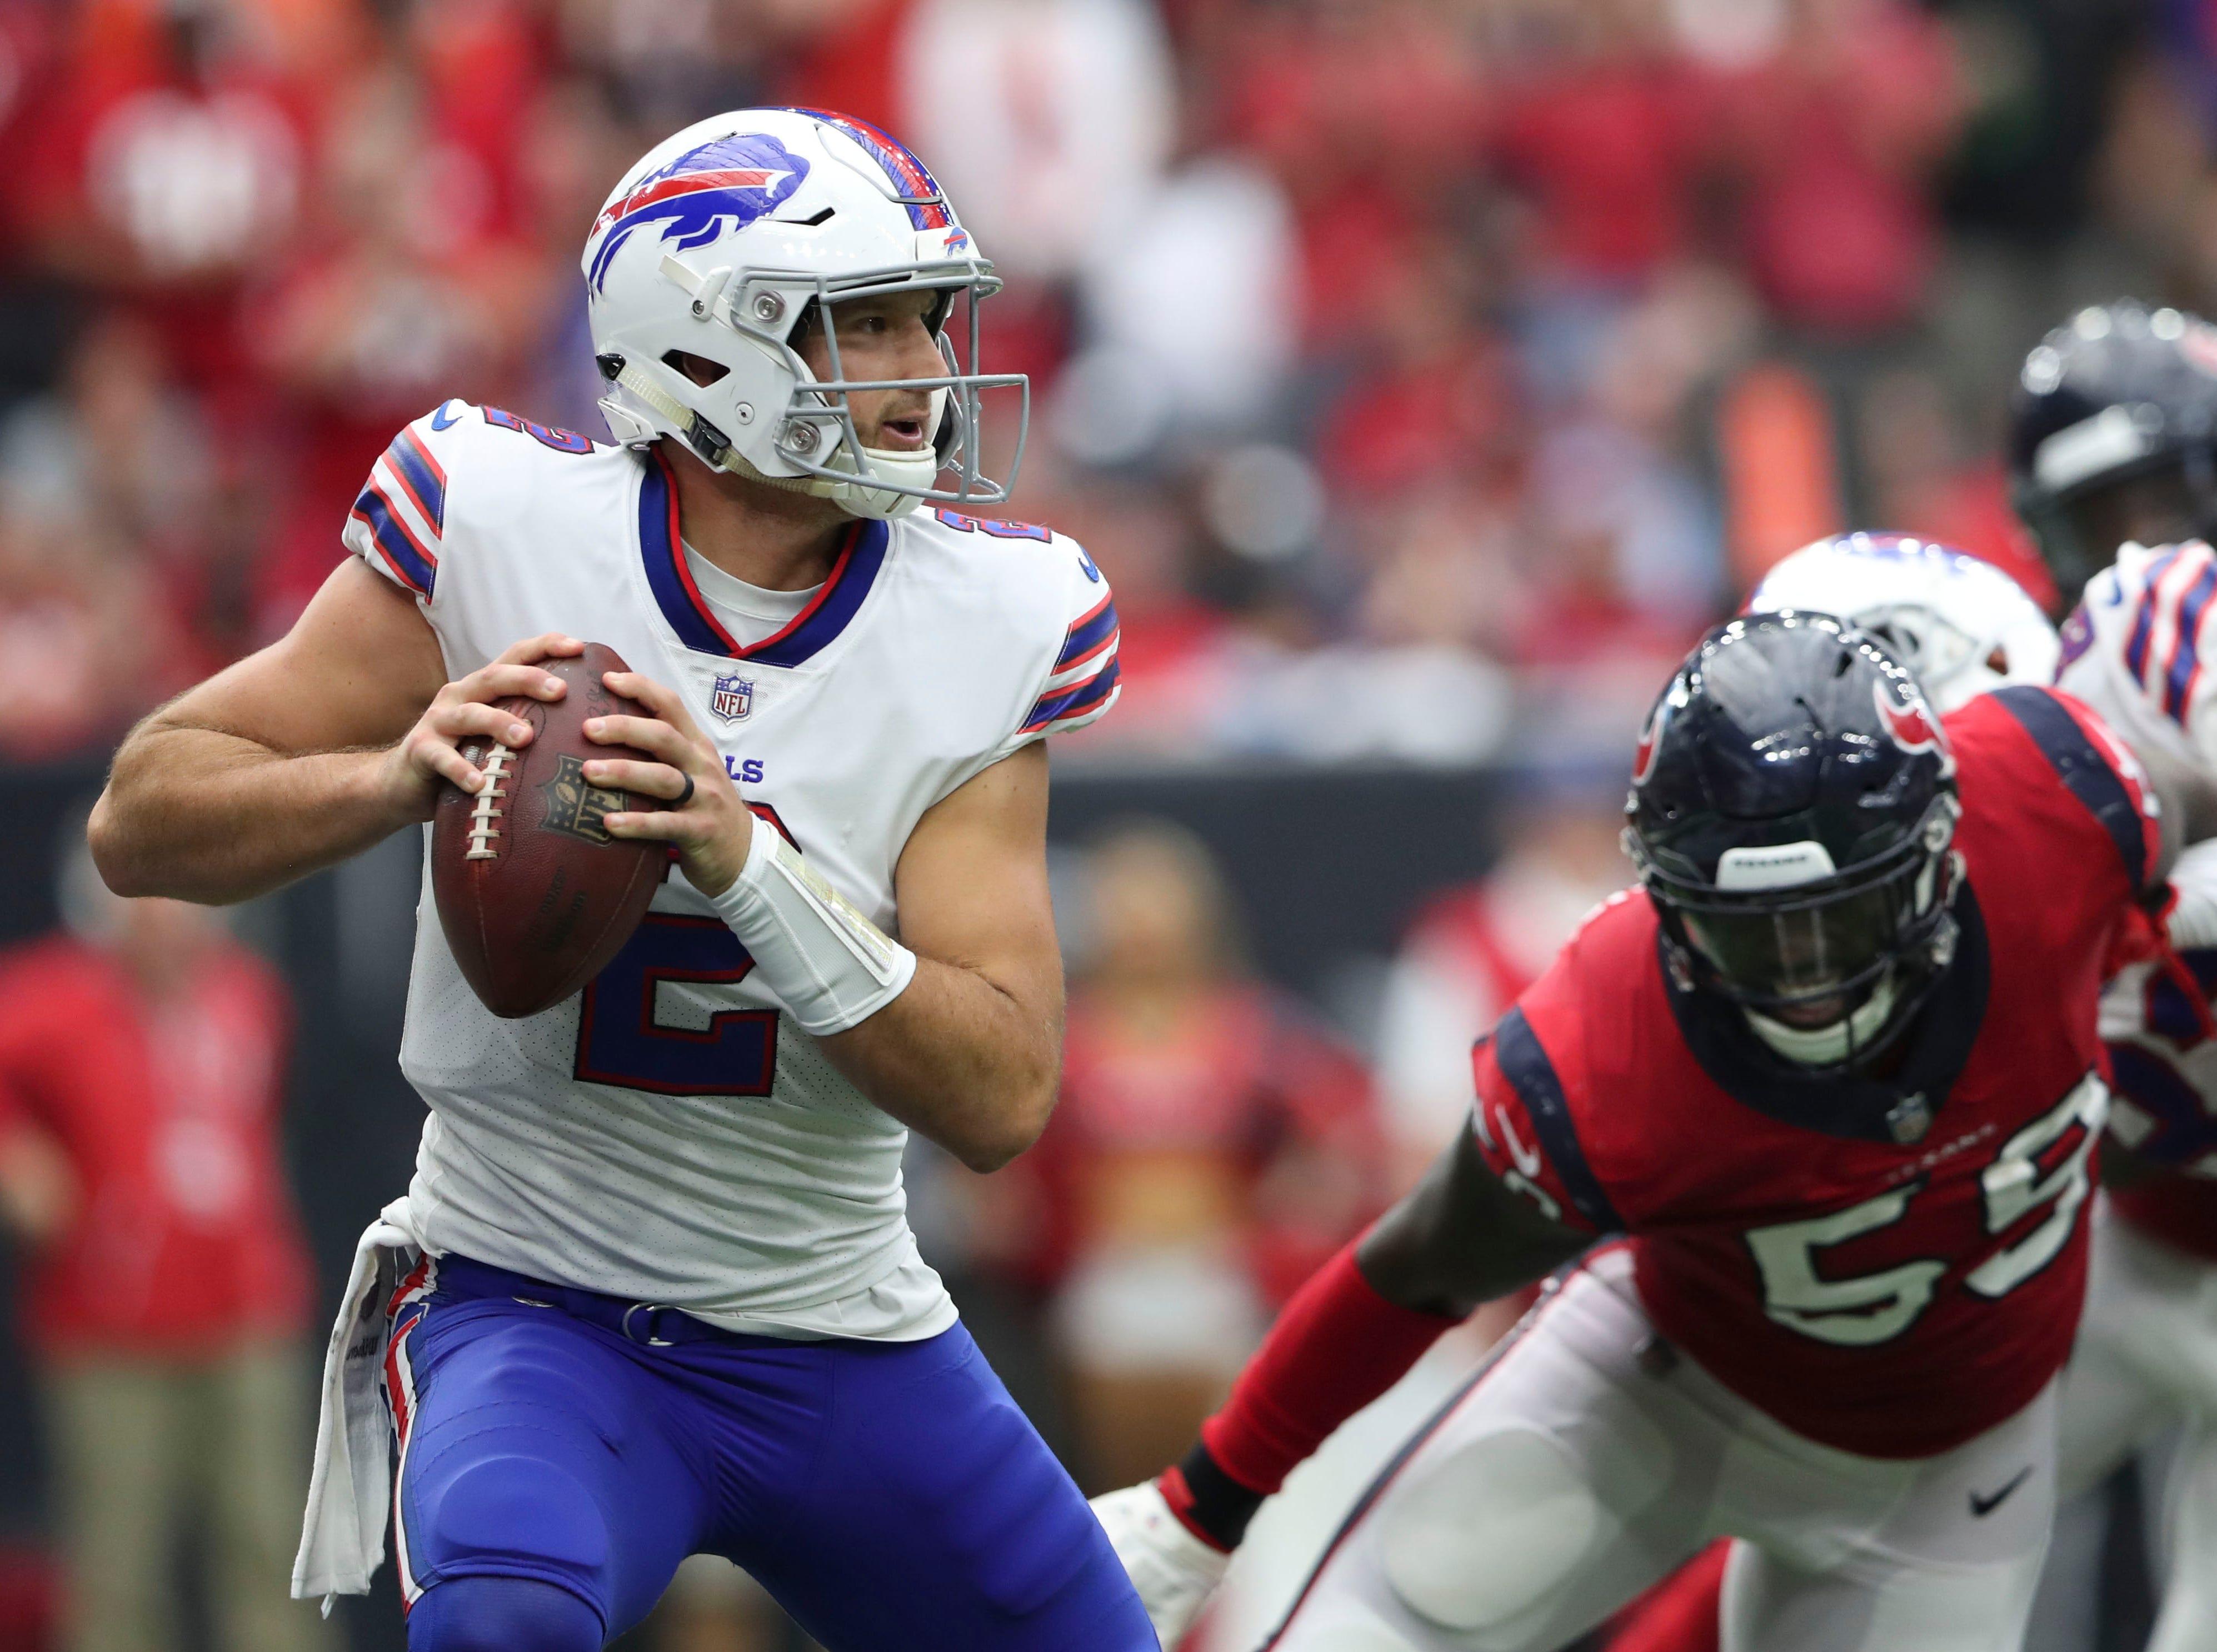 Oct 14, 2018; Houston, TX, USA; Buffalo Bills quarterback Nathan Peterman (2) throws as Houston Texans linebacker Whitney Mercilus (59) chases him during the second half at NRG Stadium. Mandatory Credit: Kevin Jairaj-USA TODAY Sports